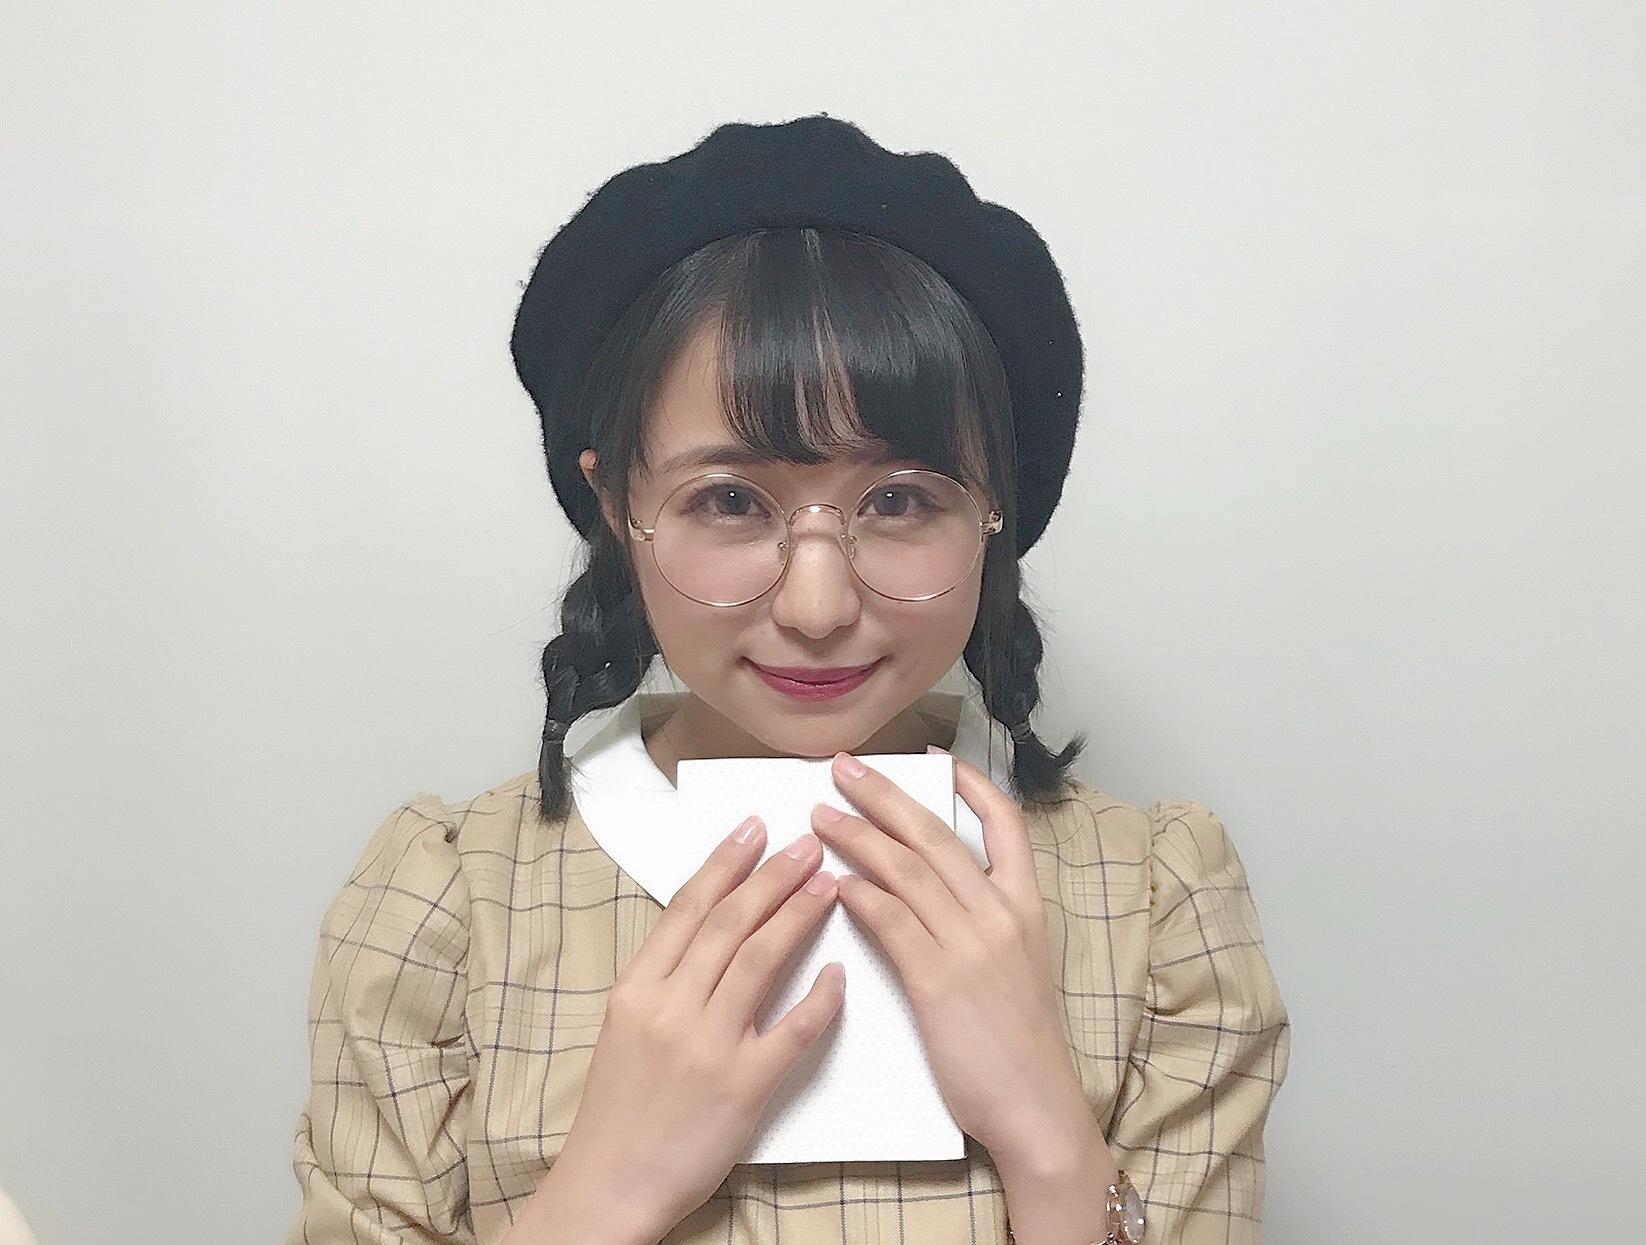 ☃︎秋冬の定番アイテム♡ベレー帽のかぶり方紹介します☃︎_1_6